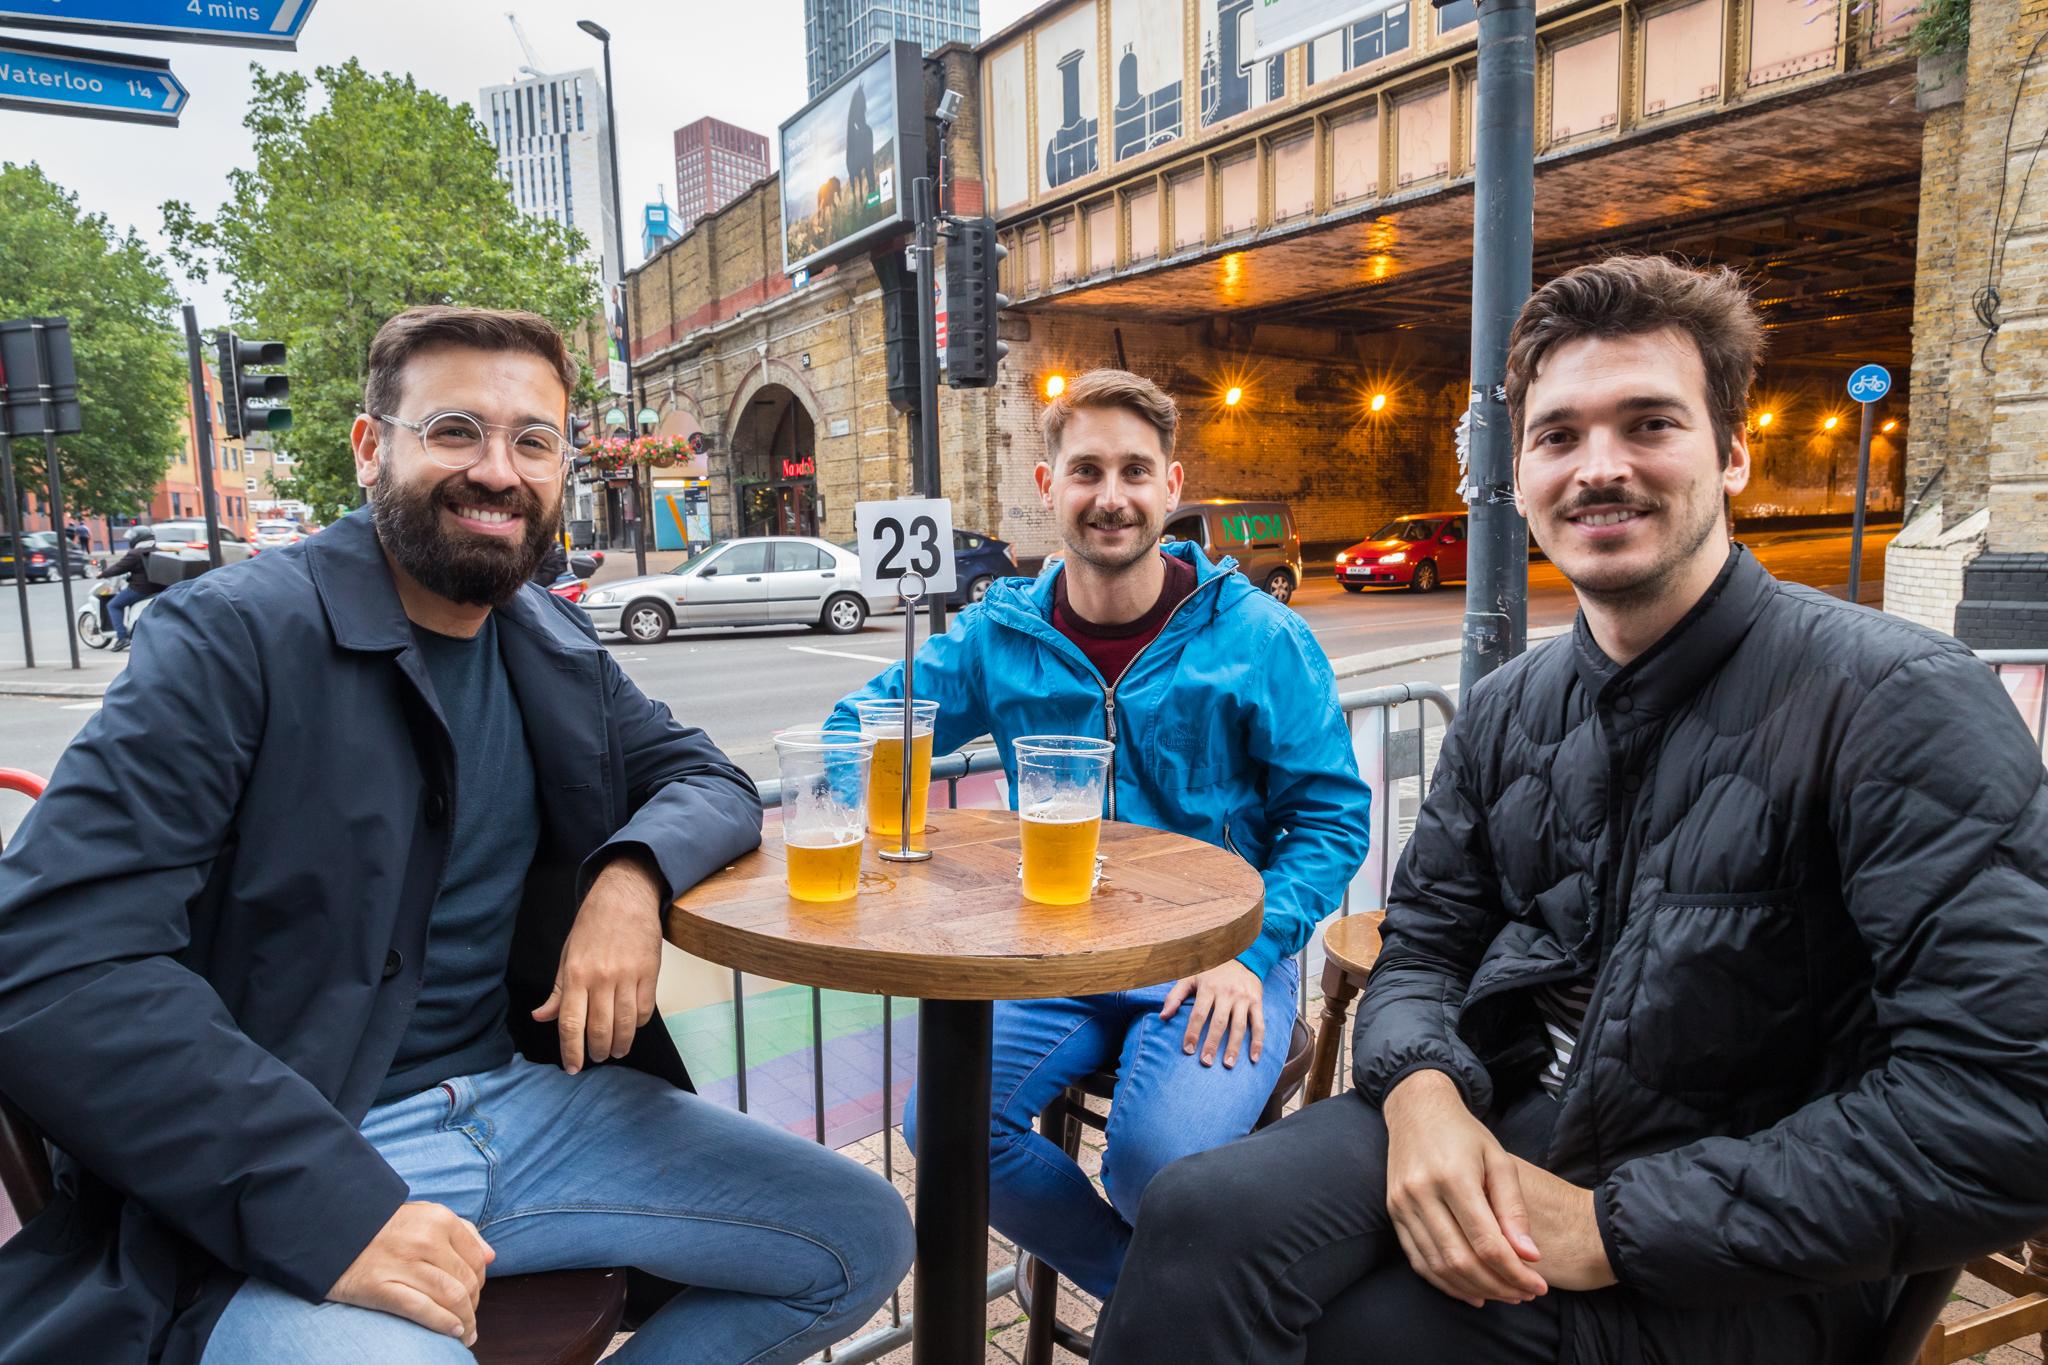 Gay bar London with terrace